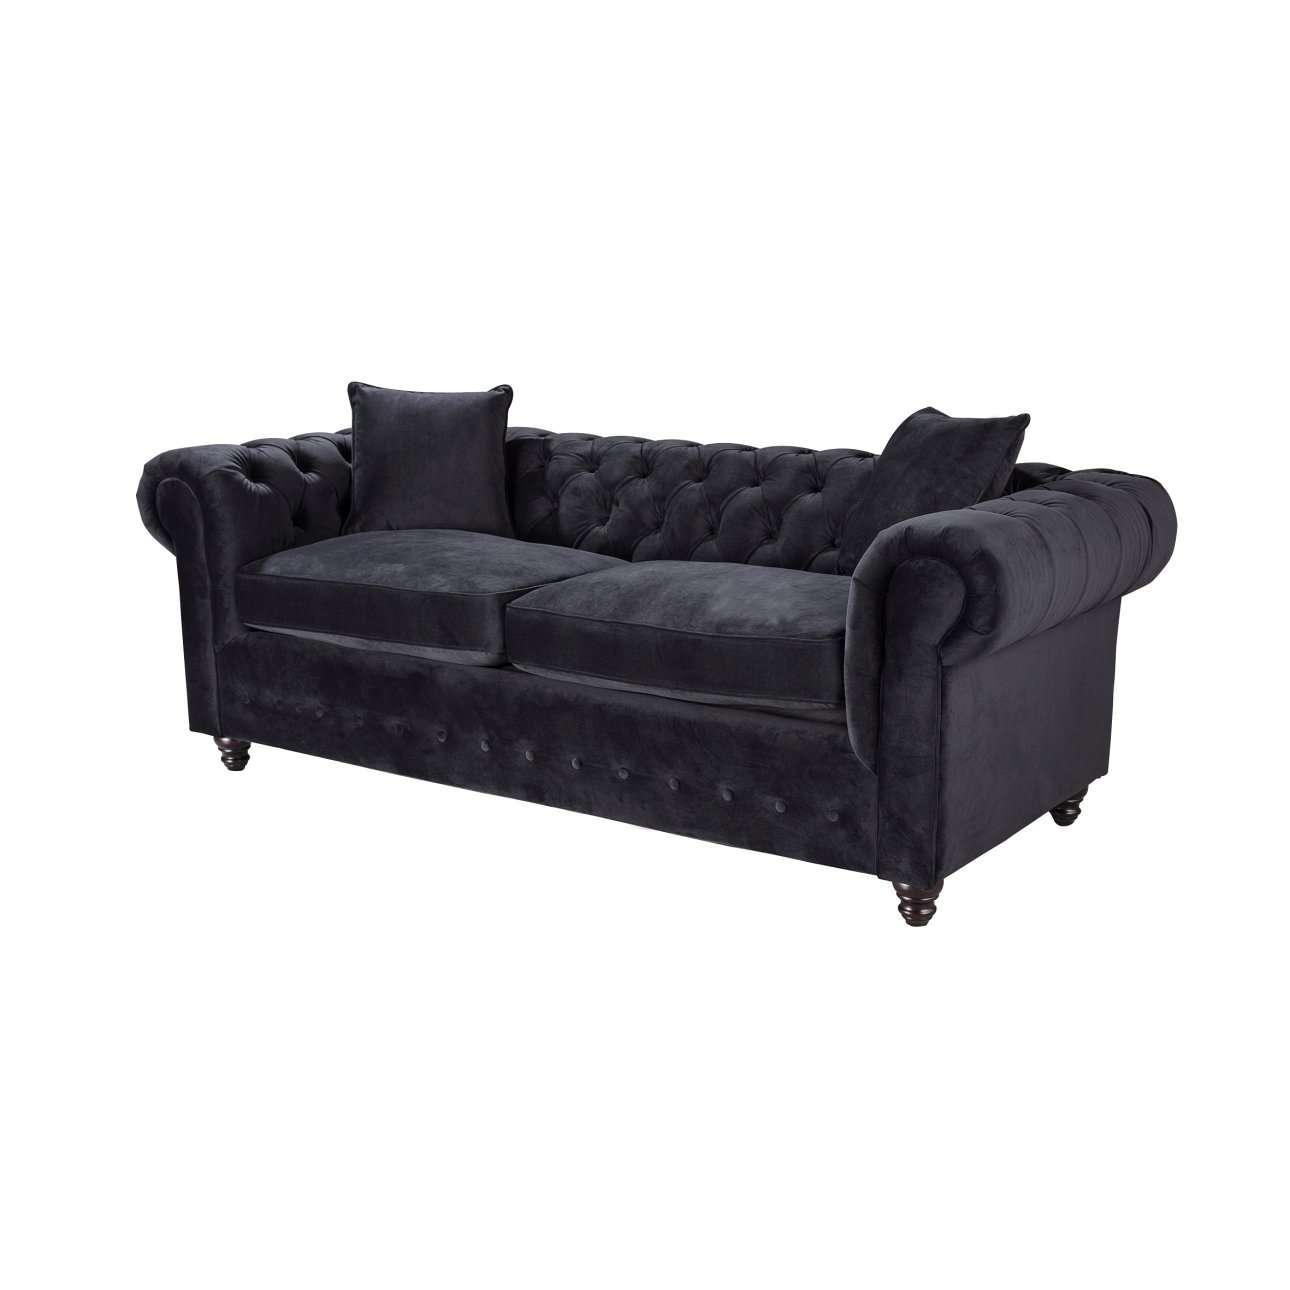 Sofa Chesterfield Velvet Onyx 3-Sitzer